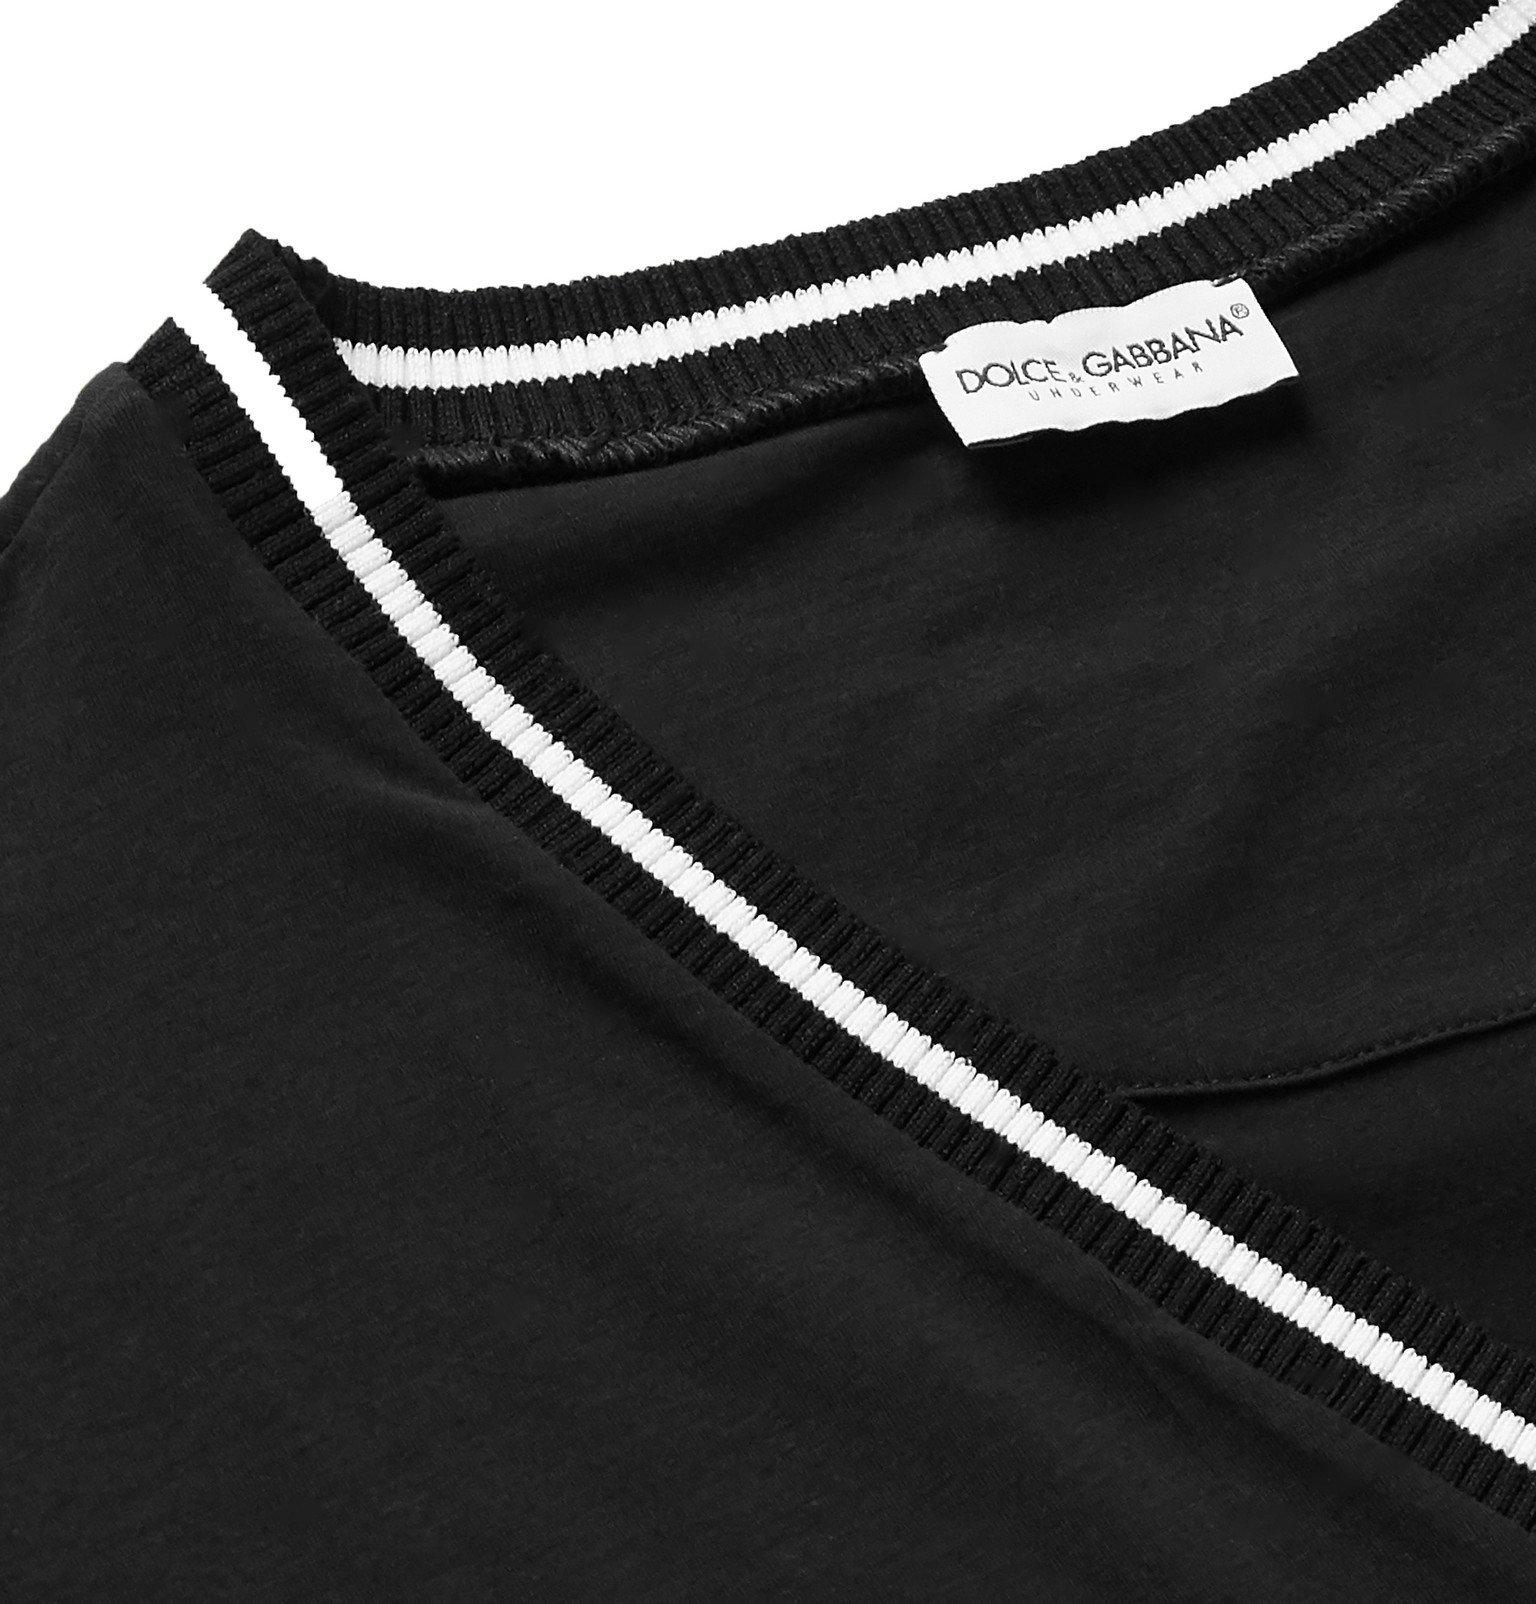 Dolce & Gabbana - Stretch Cotton-Jersey T-Shirt - Black